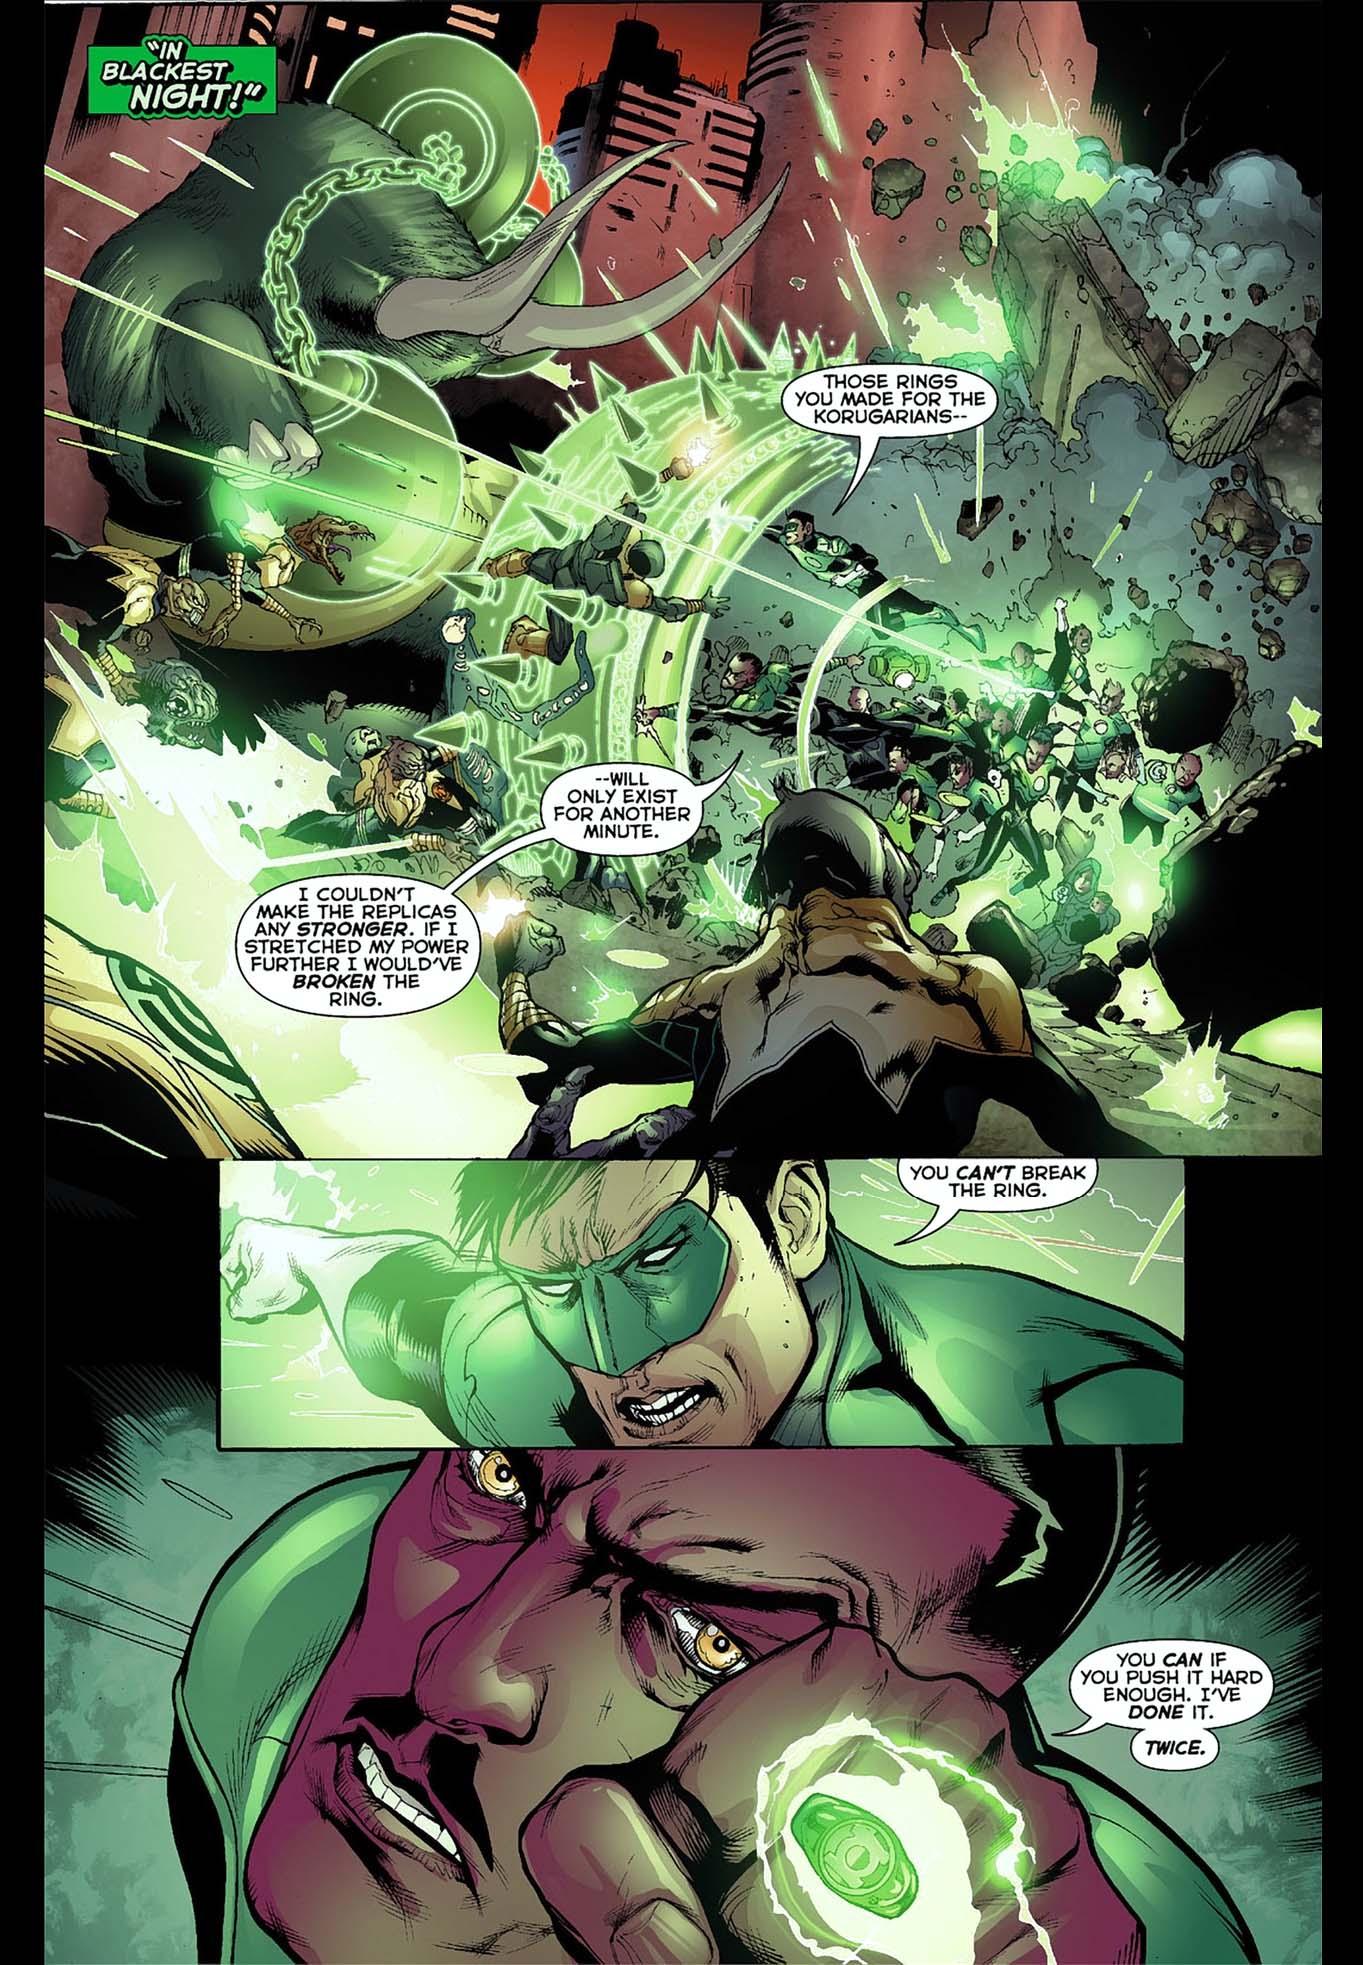 sinestro destroyed 2 green lantern rings